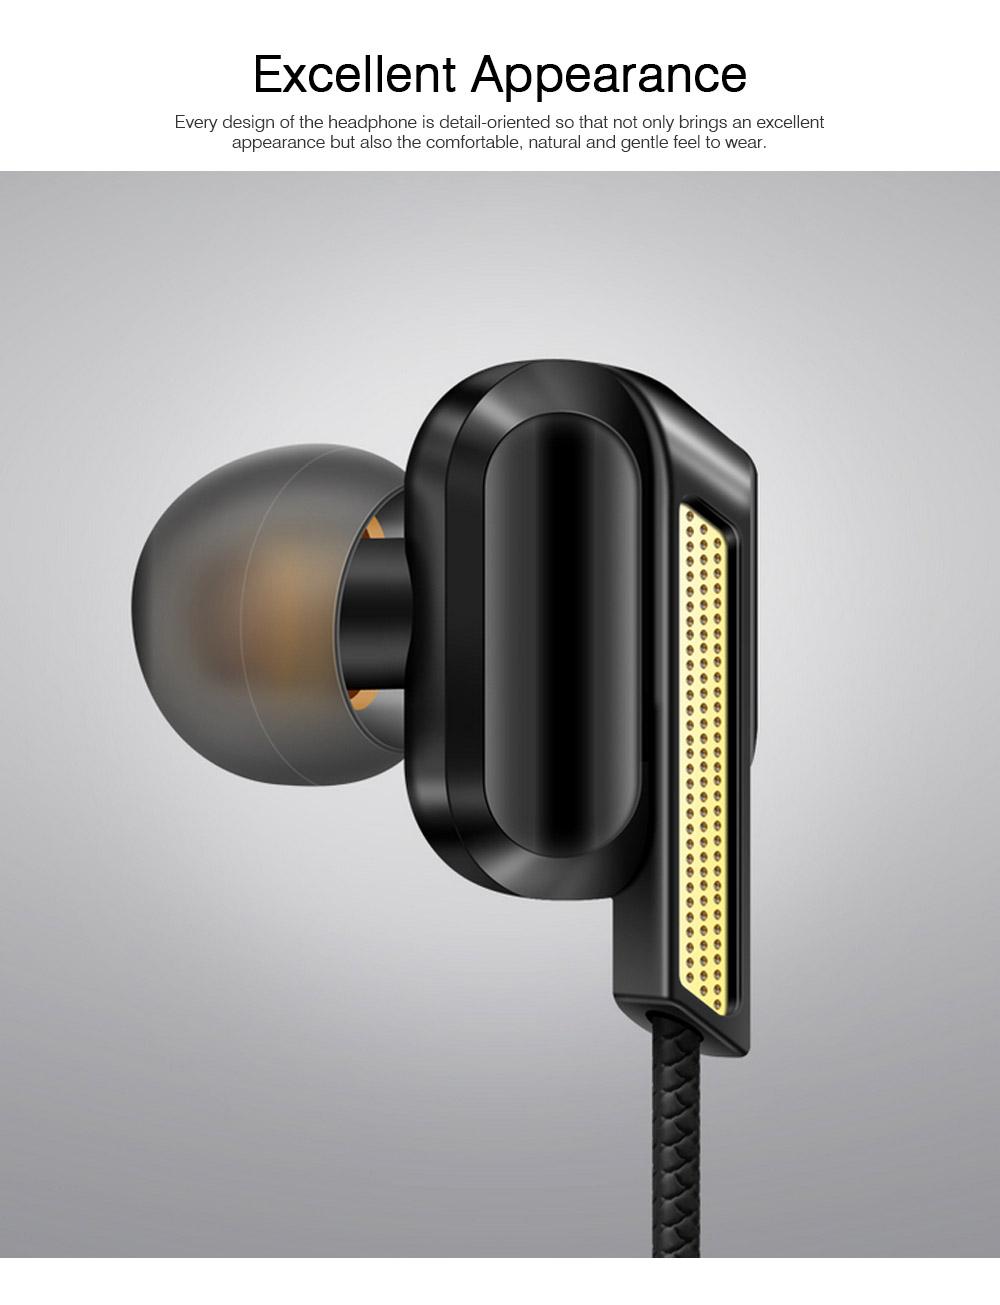 In-Ear Headphones for Original Huawei Phones iPhone Vivo OPPO SoundSport Headphones with Mic Wired In-ear Earphone 4